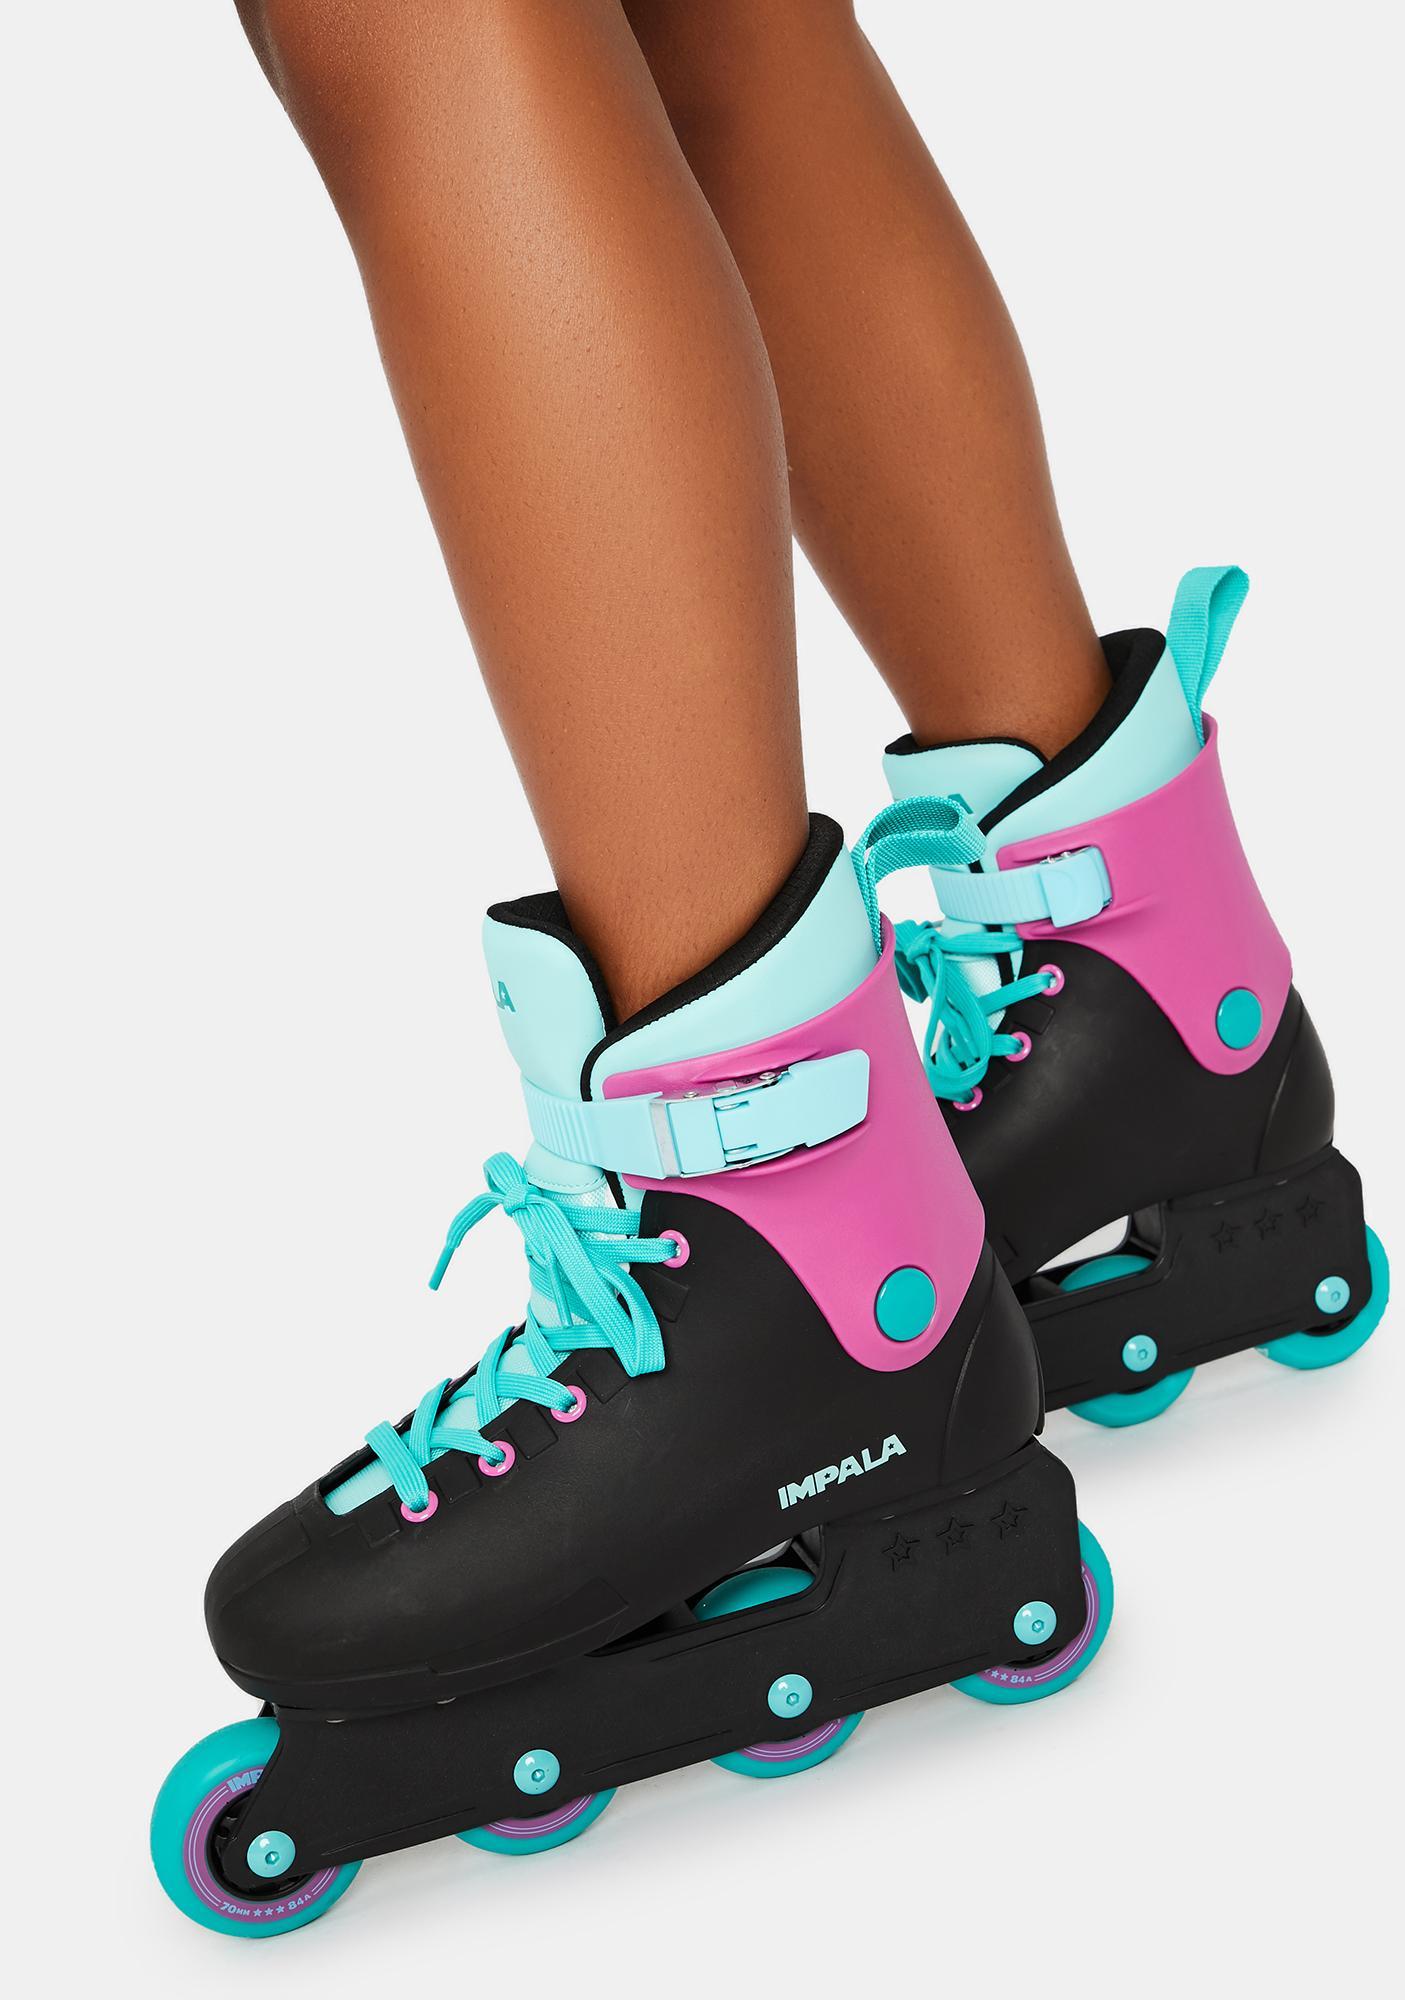 Impala Rollerskates Black Berry Lightspeed Inline Skate